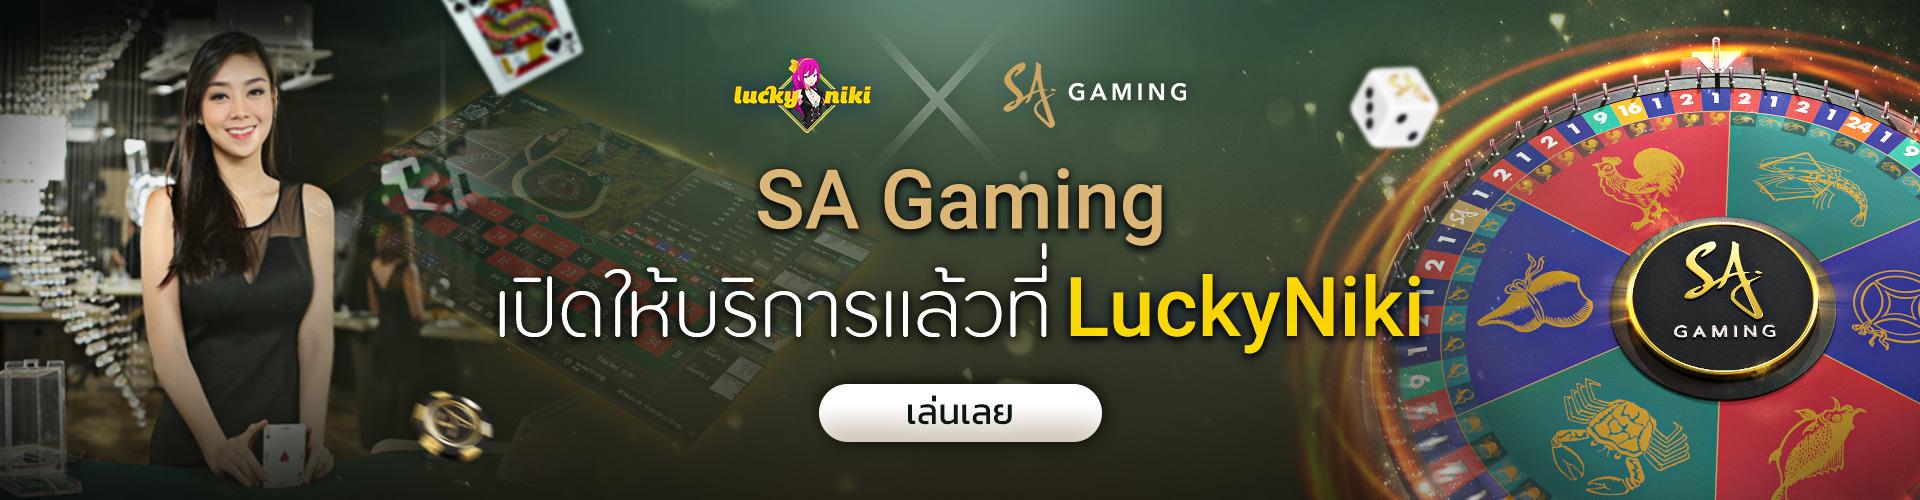 SA Gaming เปิดให้บริการแล้วที่ LuckyNiki